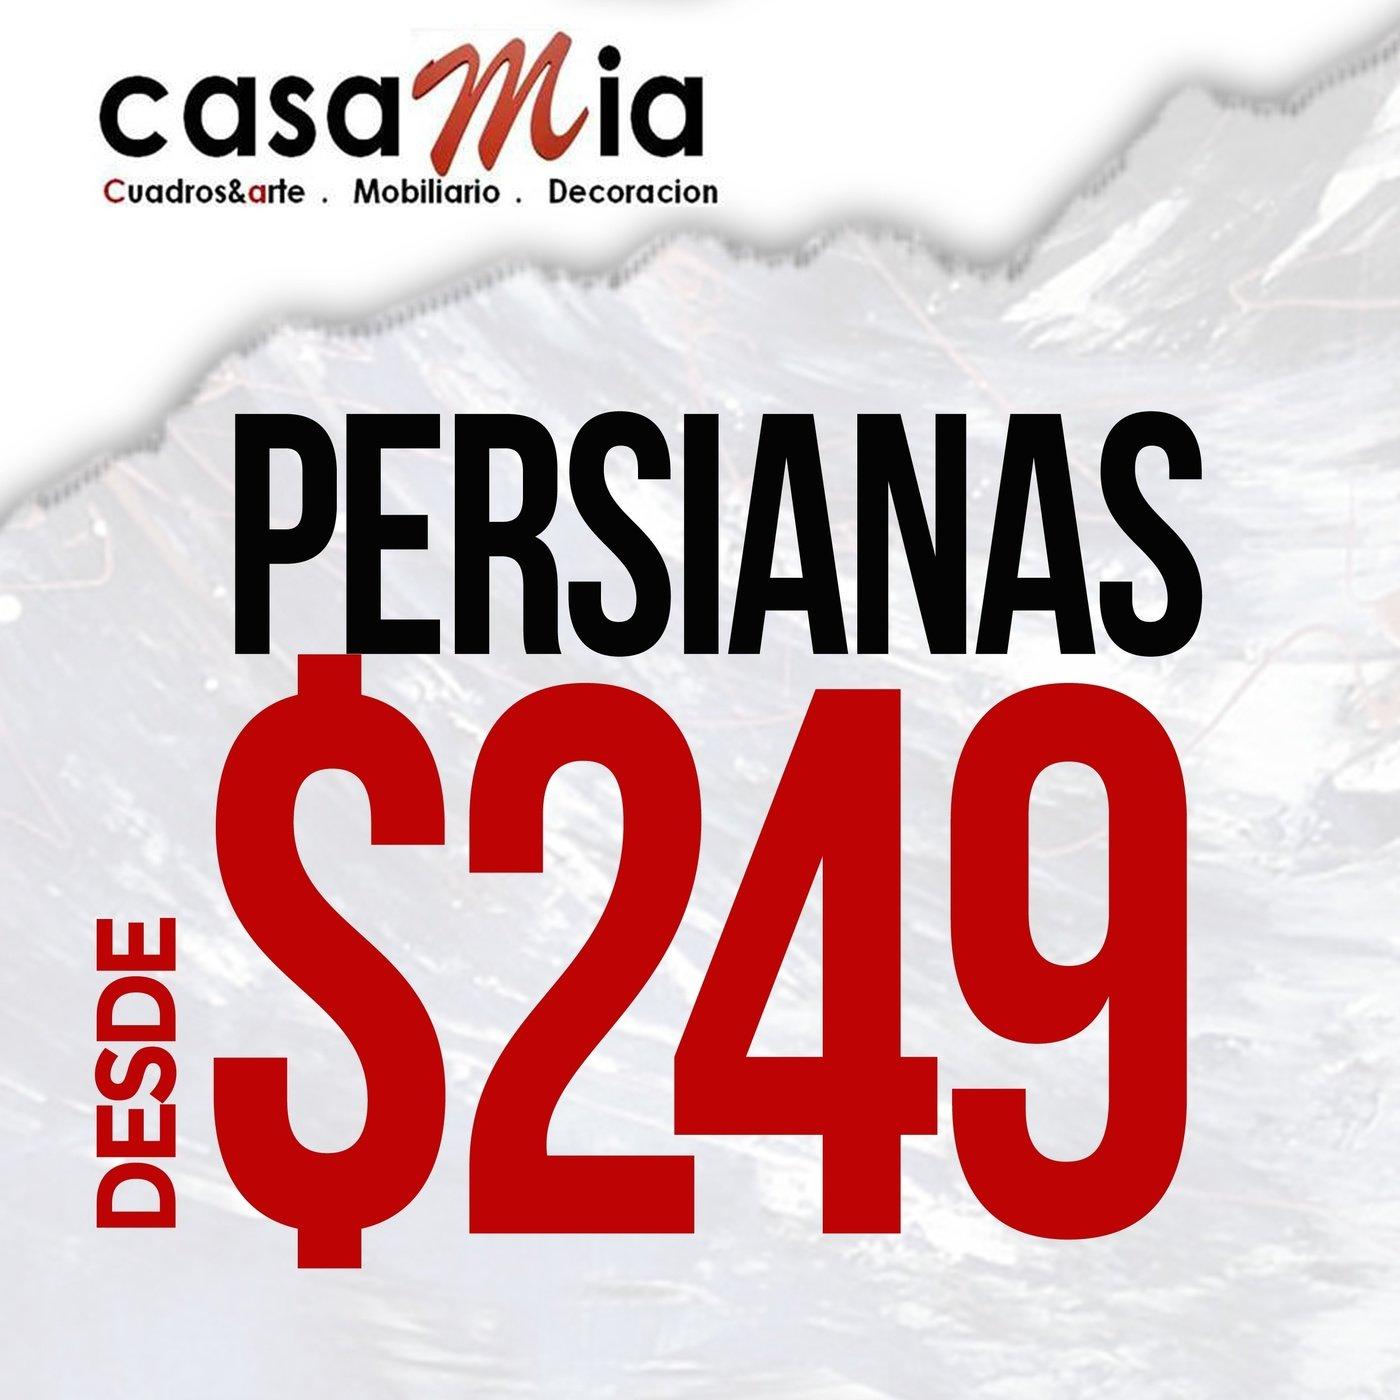 Casamia Muebles Y Accesorios By Bni Cd Juarez At Coroflot Com # Saja Muebles Chihuahua